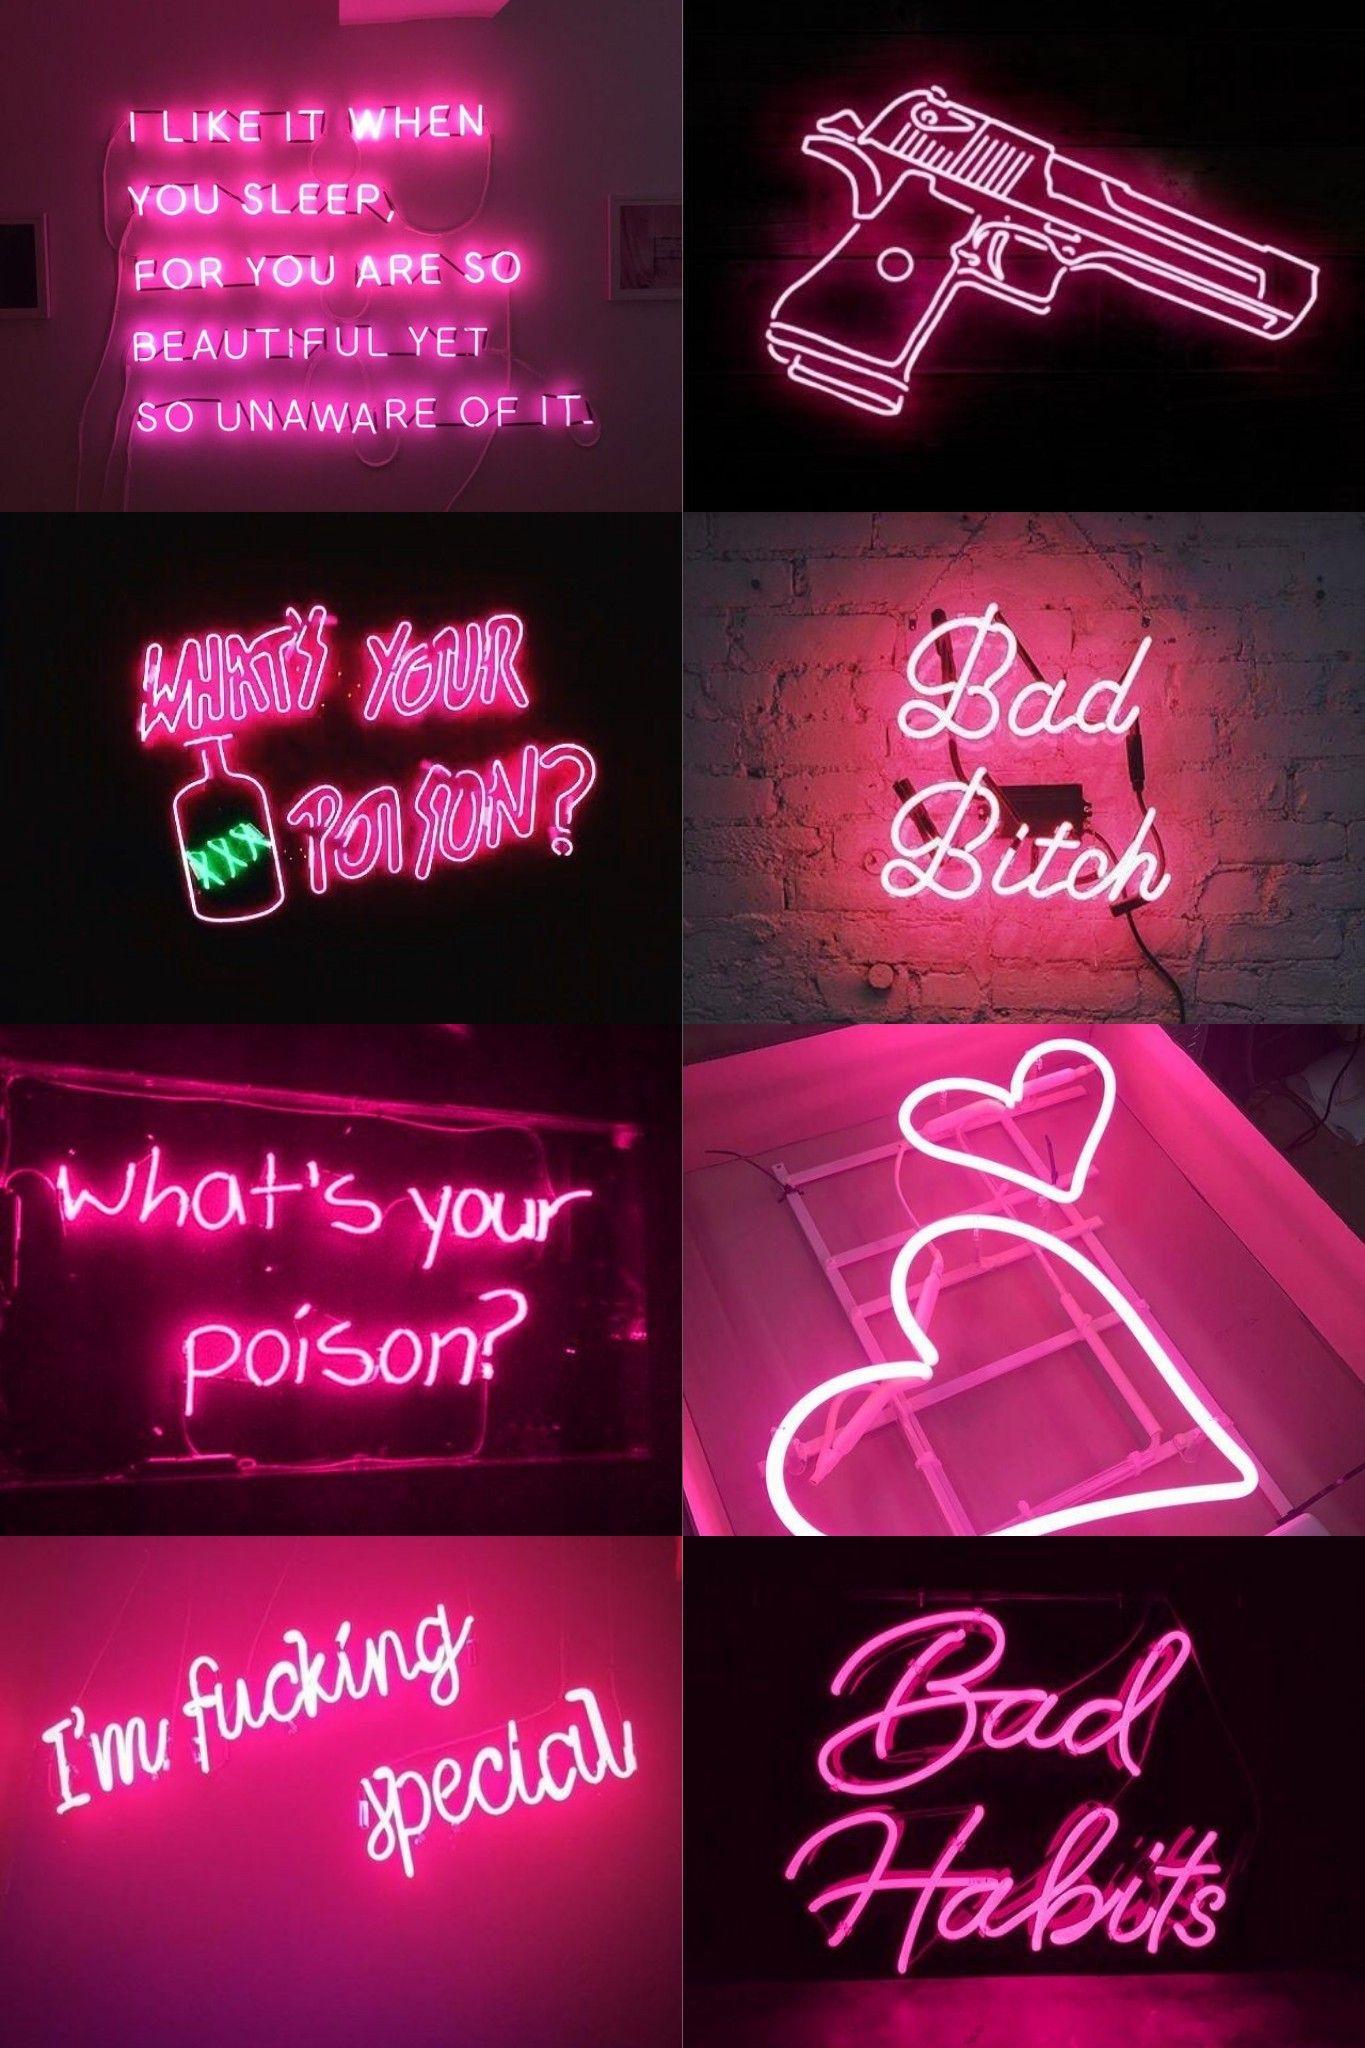 Neon Pink Aesthetic Wallpaper Aesthetic Iphone Wallpaper Iphone Wallpaper Tumblr Aesthetic Aesthetic Pastel Wallpaper